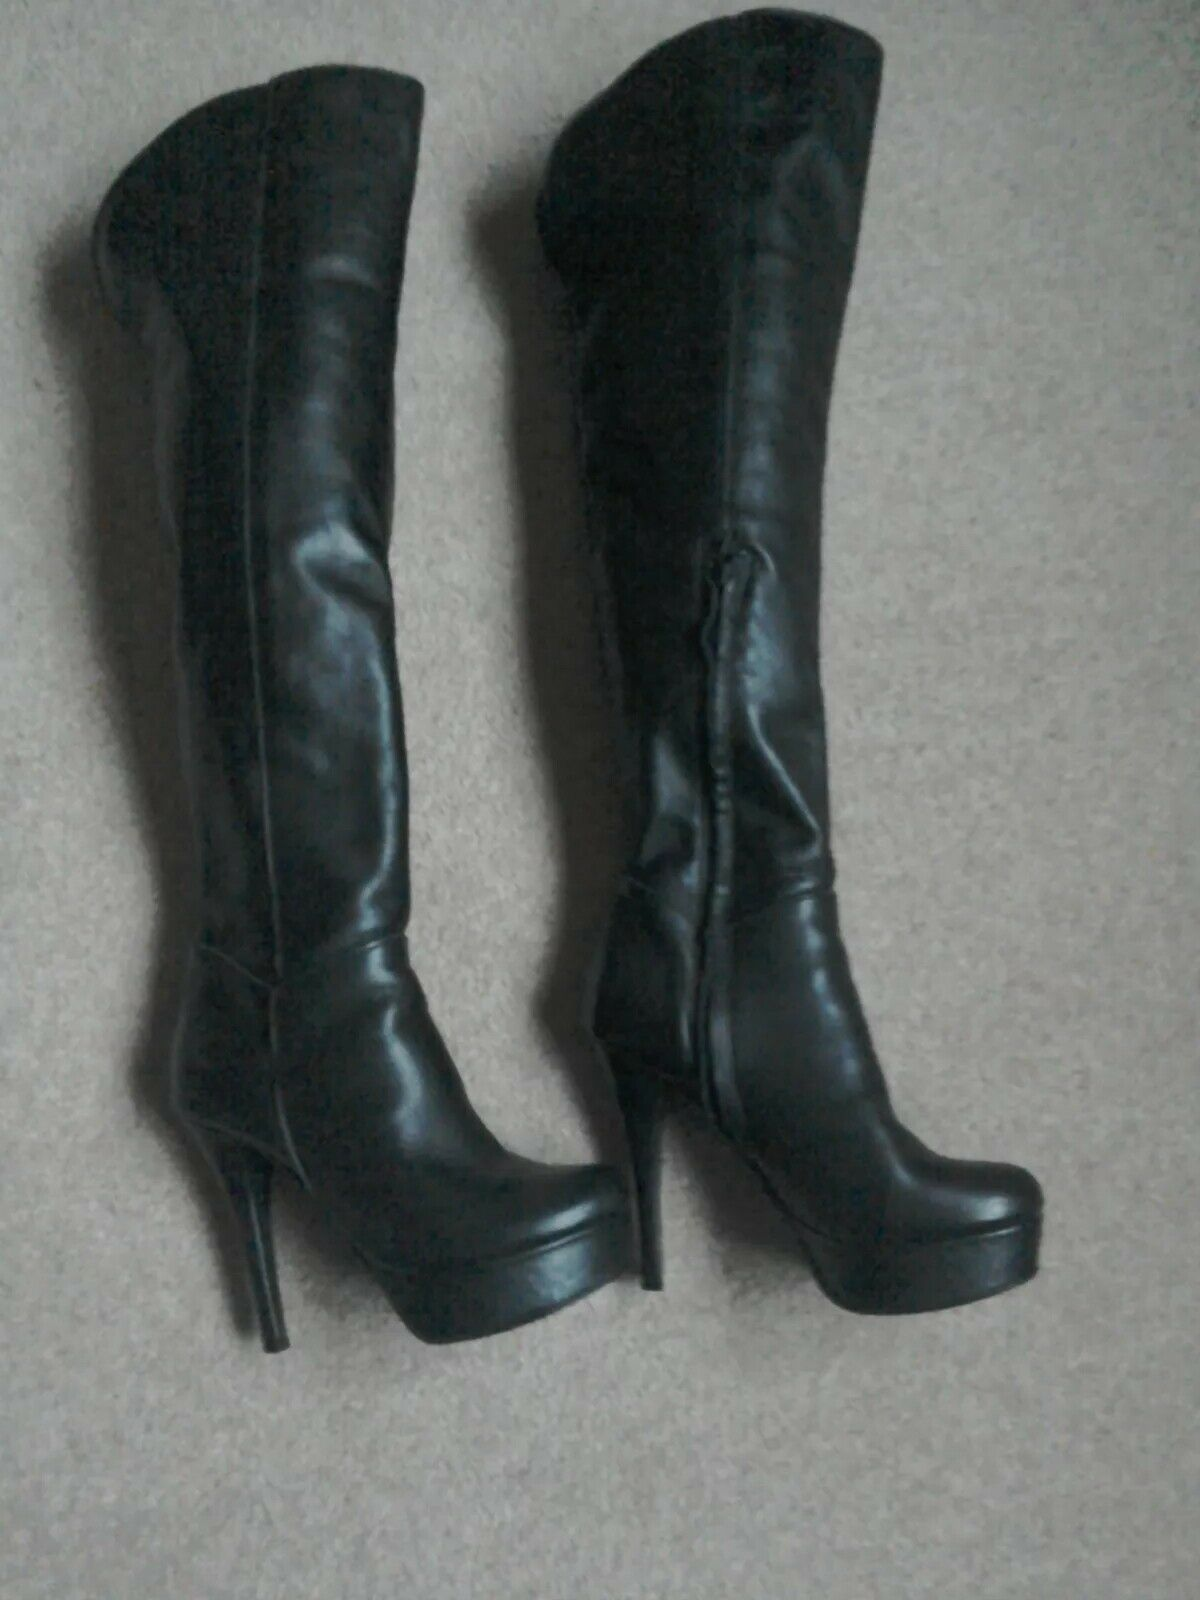 Moda in Pelle Stiefel. schwarz over the knee Stiefel. Pelle Größe 5 b648f2